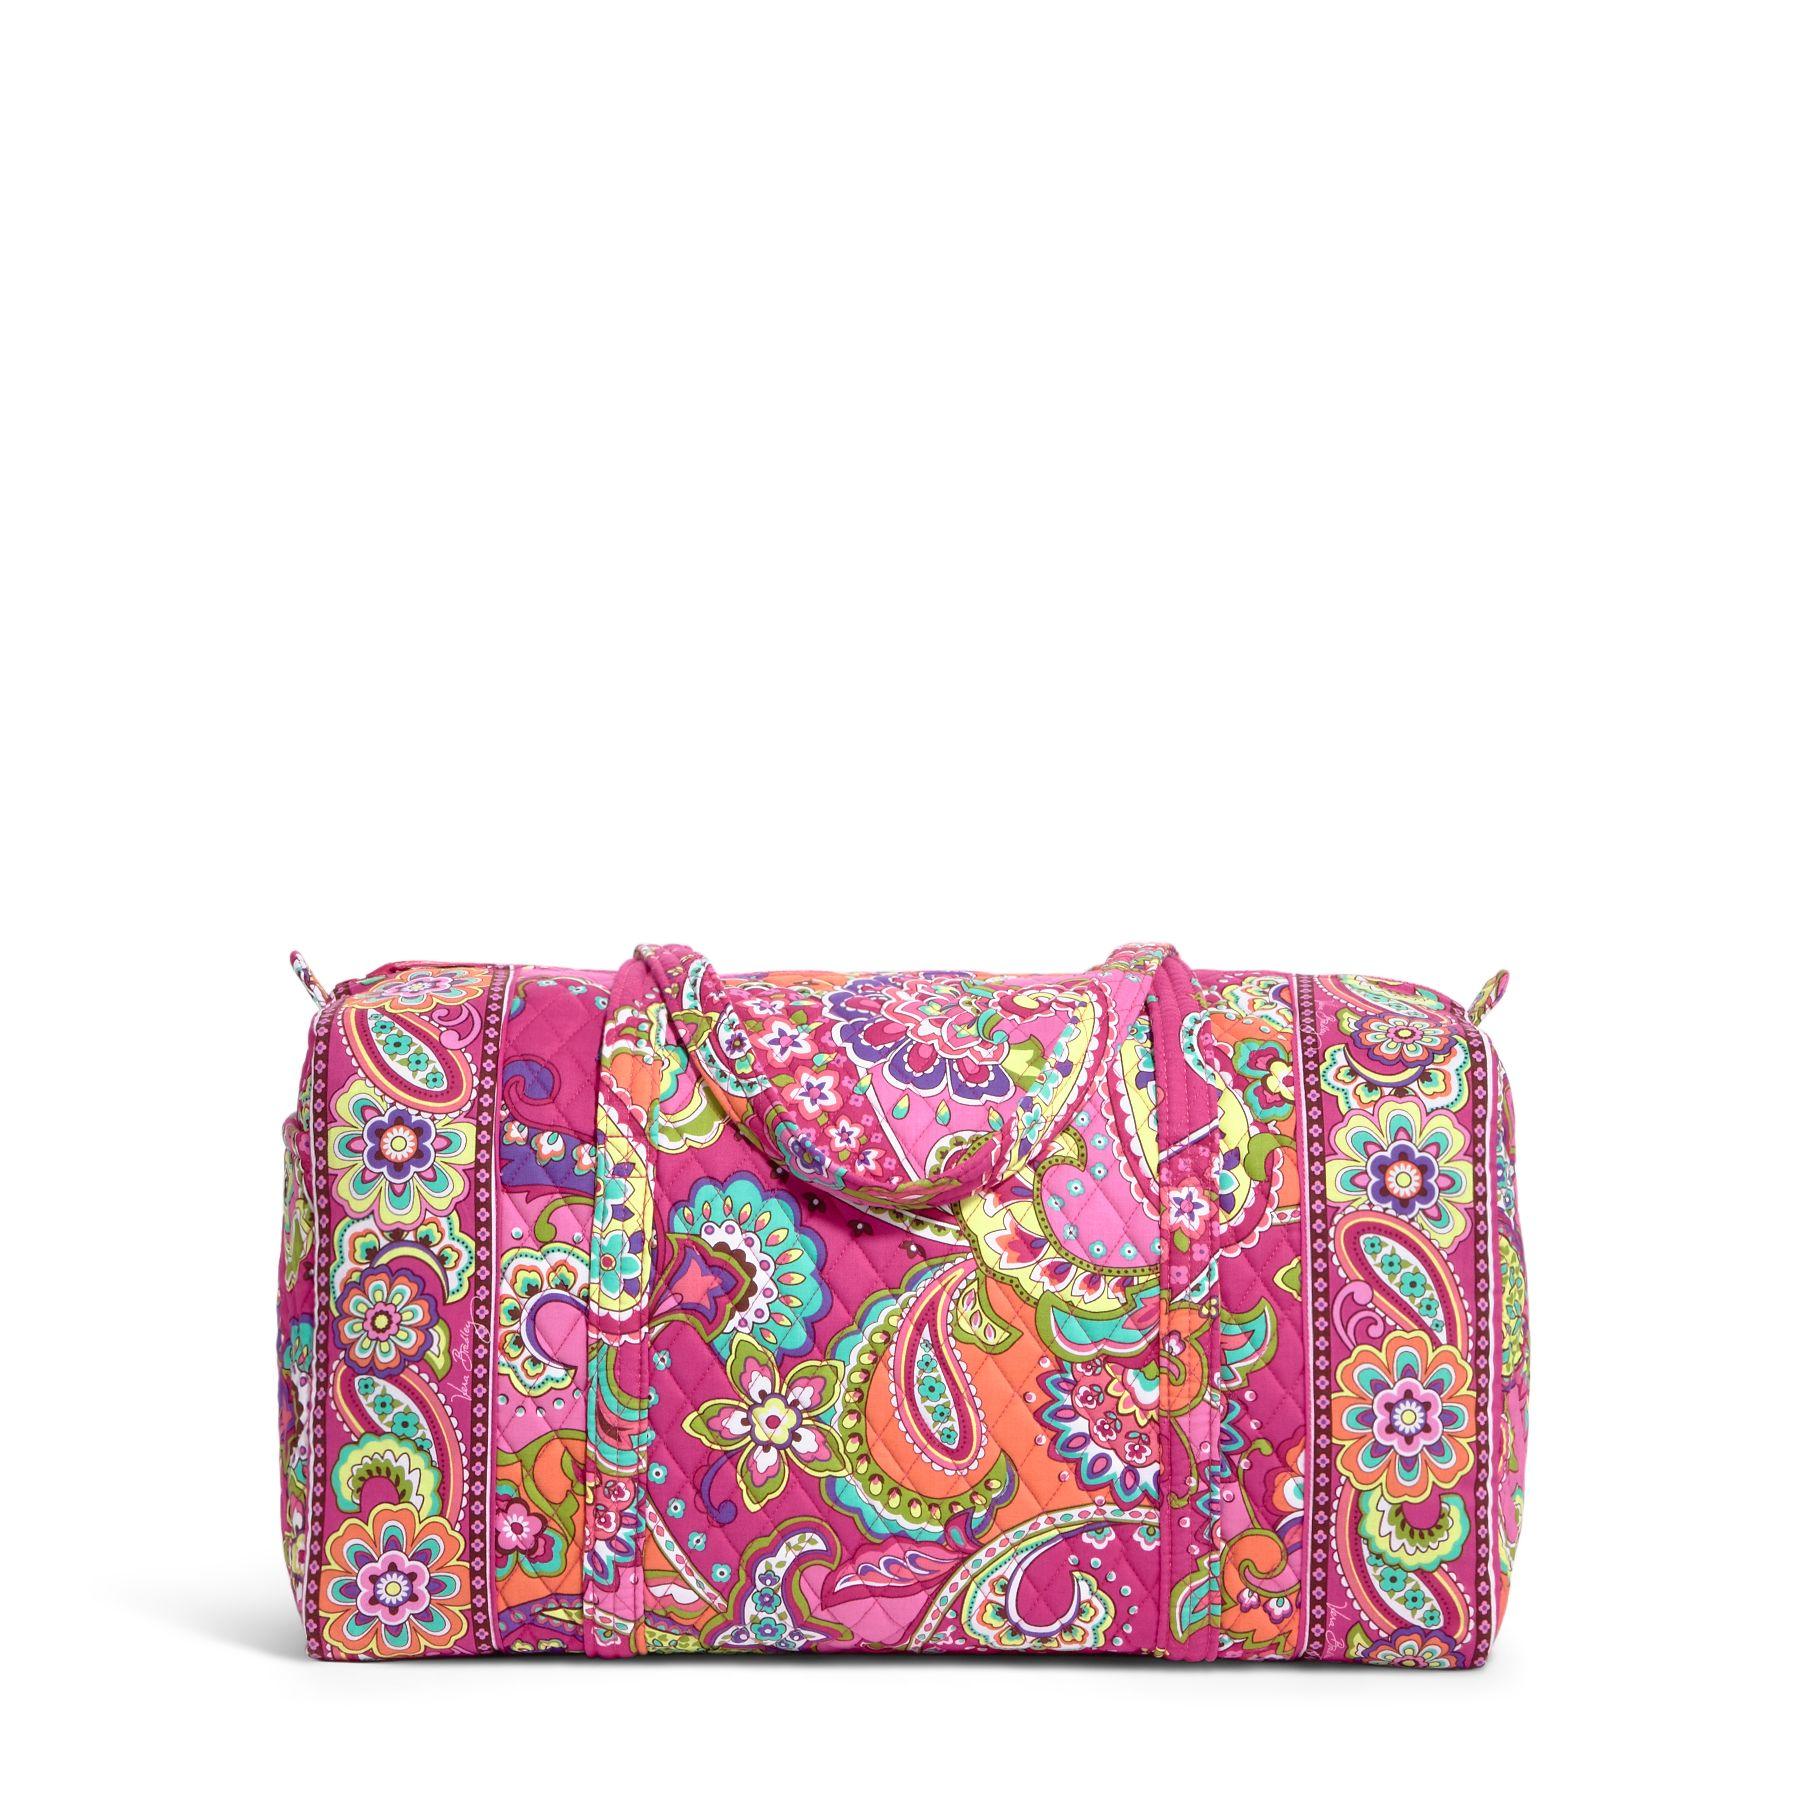 Vera Bradley Large Duffel Travel Bag in Pink Swirls